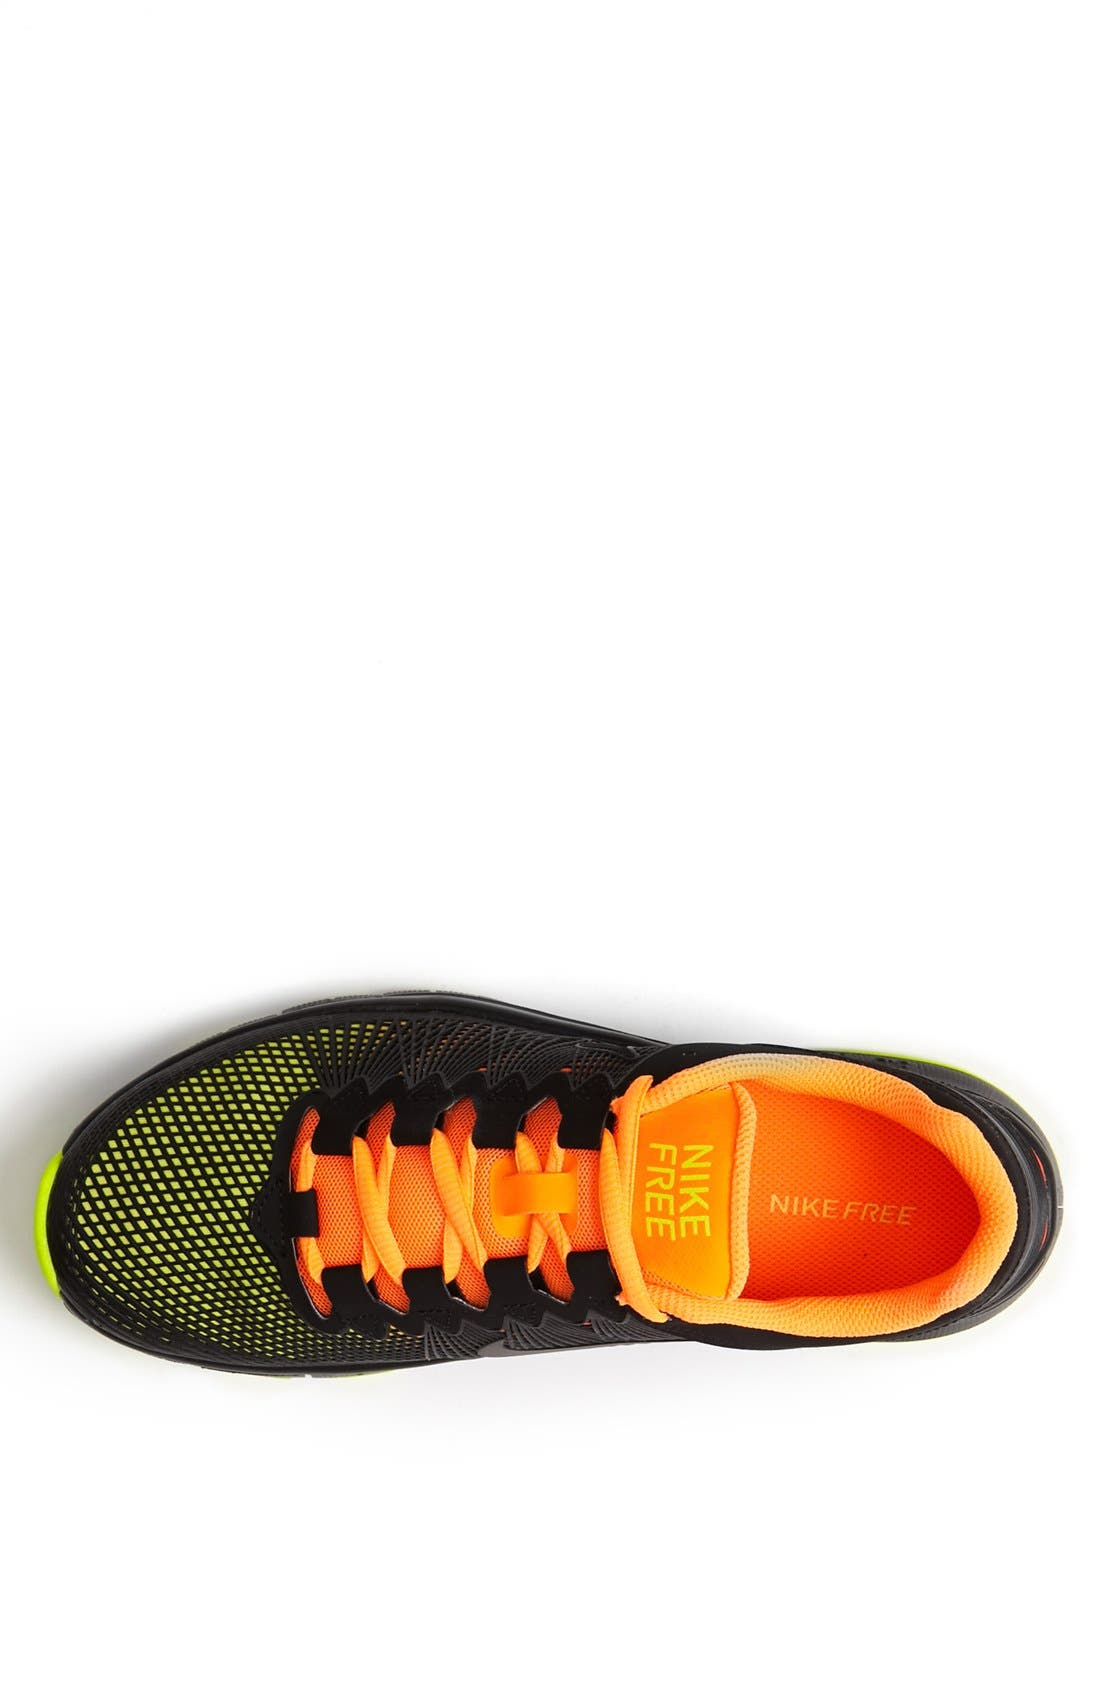 Alternate Image 3  - Nike 'Free Trainer 3.0 NRG' Training Shoe (Men)